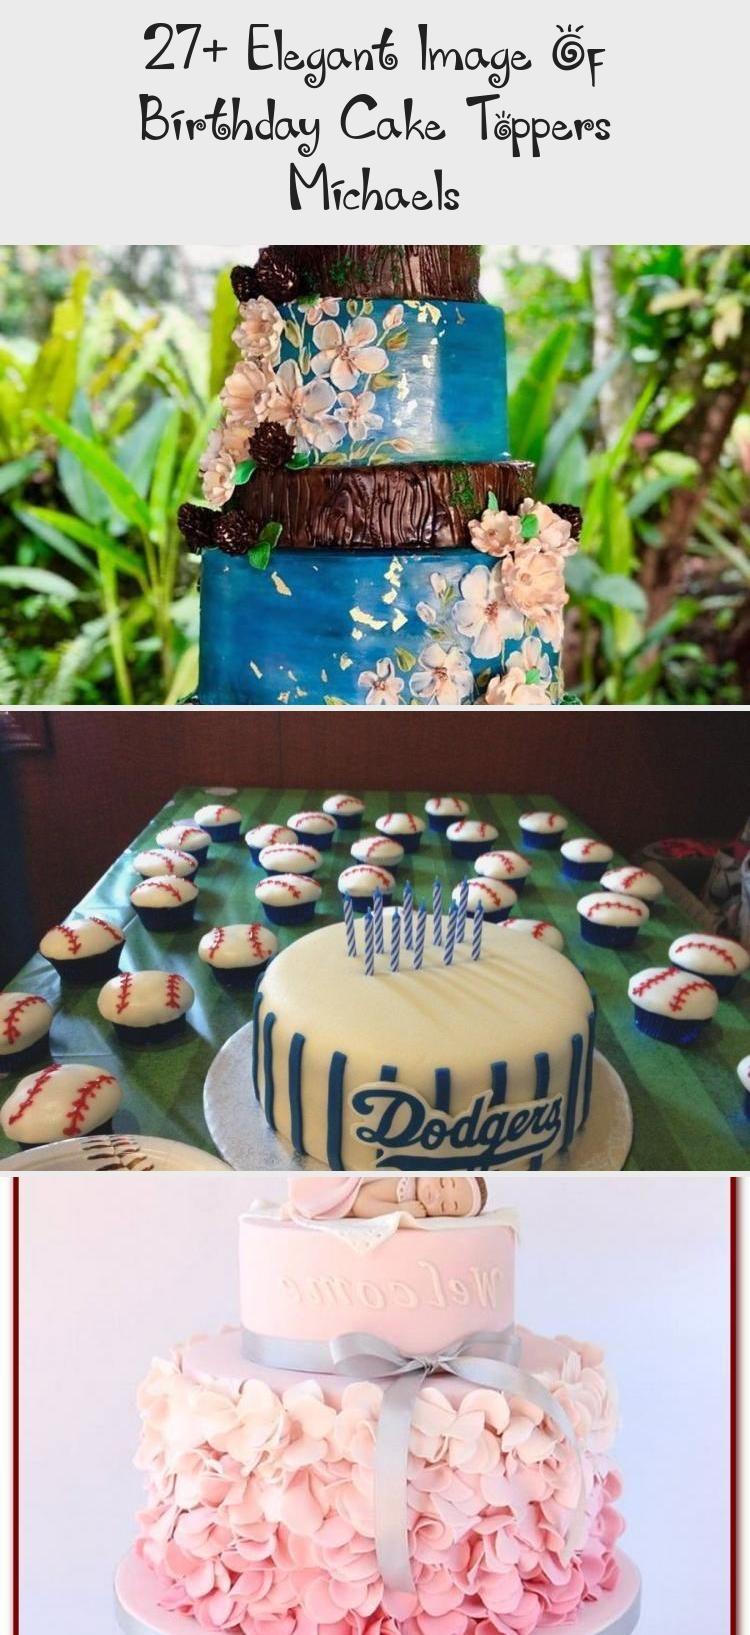 27 Elegant Image Of Birthday Cake Toppers Michaels Decoration Birthday Cake Toppers Unique Birthday Cakes Simple Birthday Cake